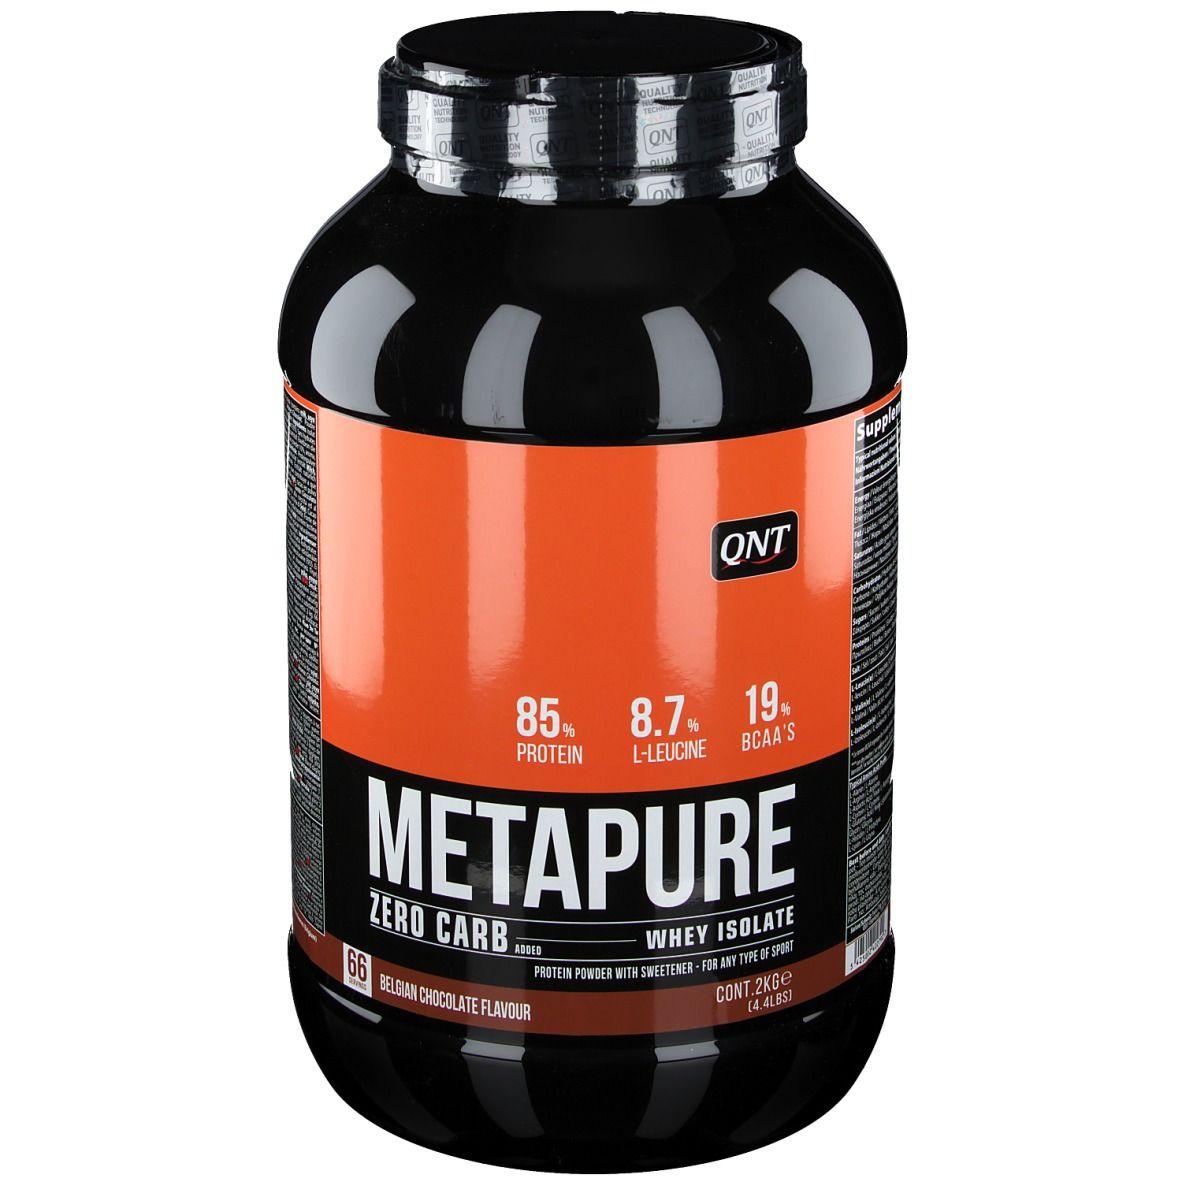 QNT Metapure Whey protein isolate Zero Carb Chocolat Belge kg poudre